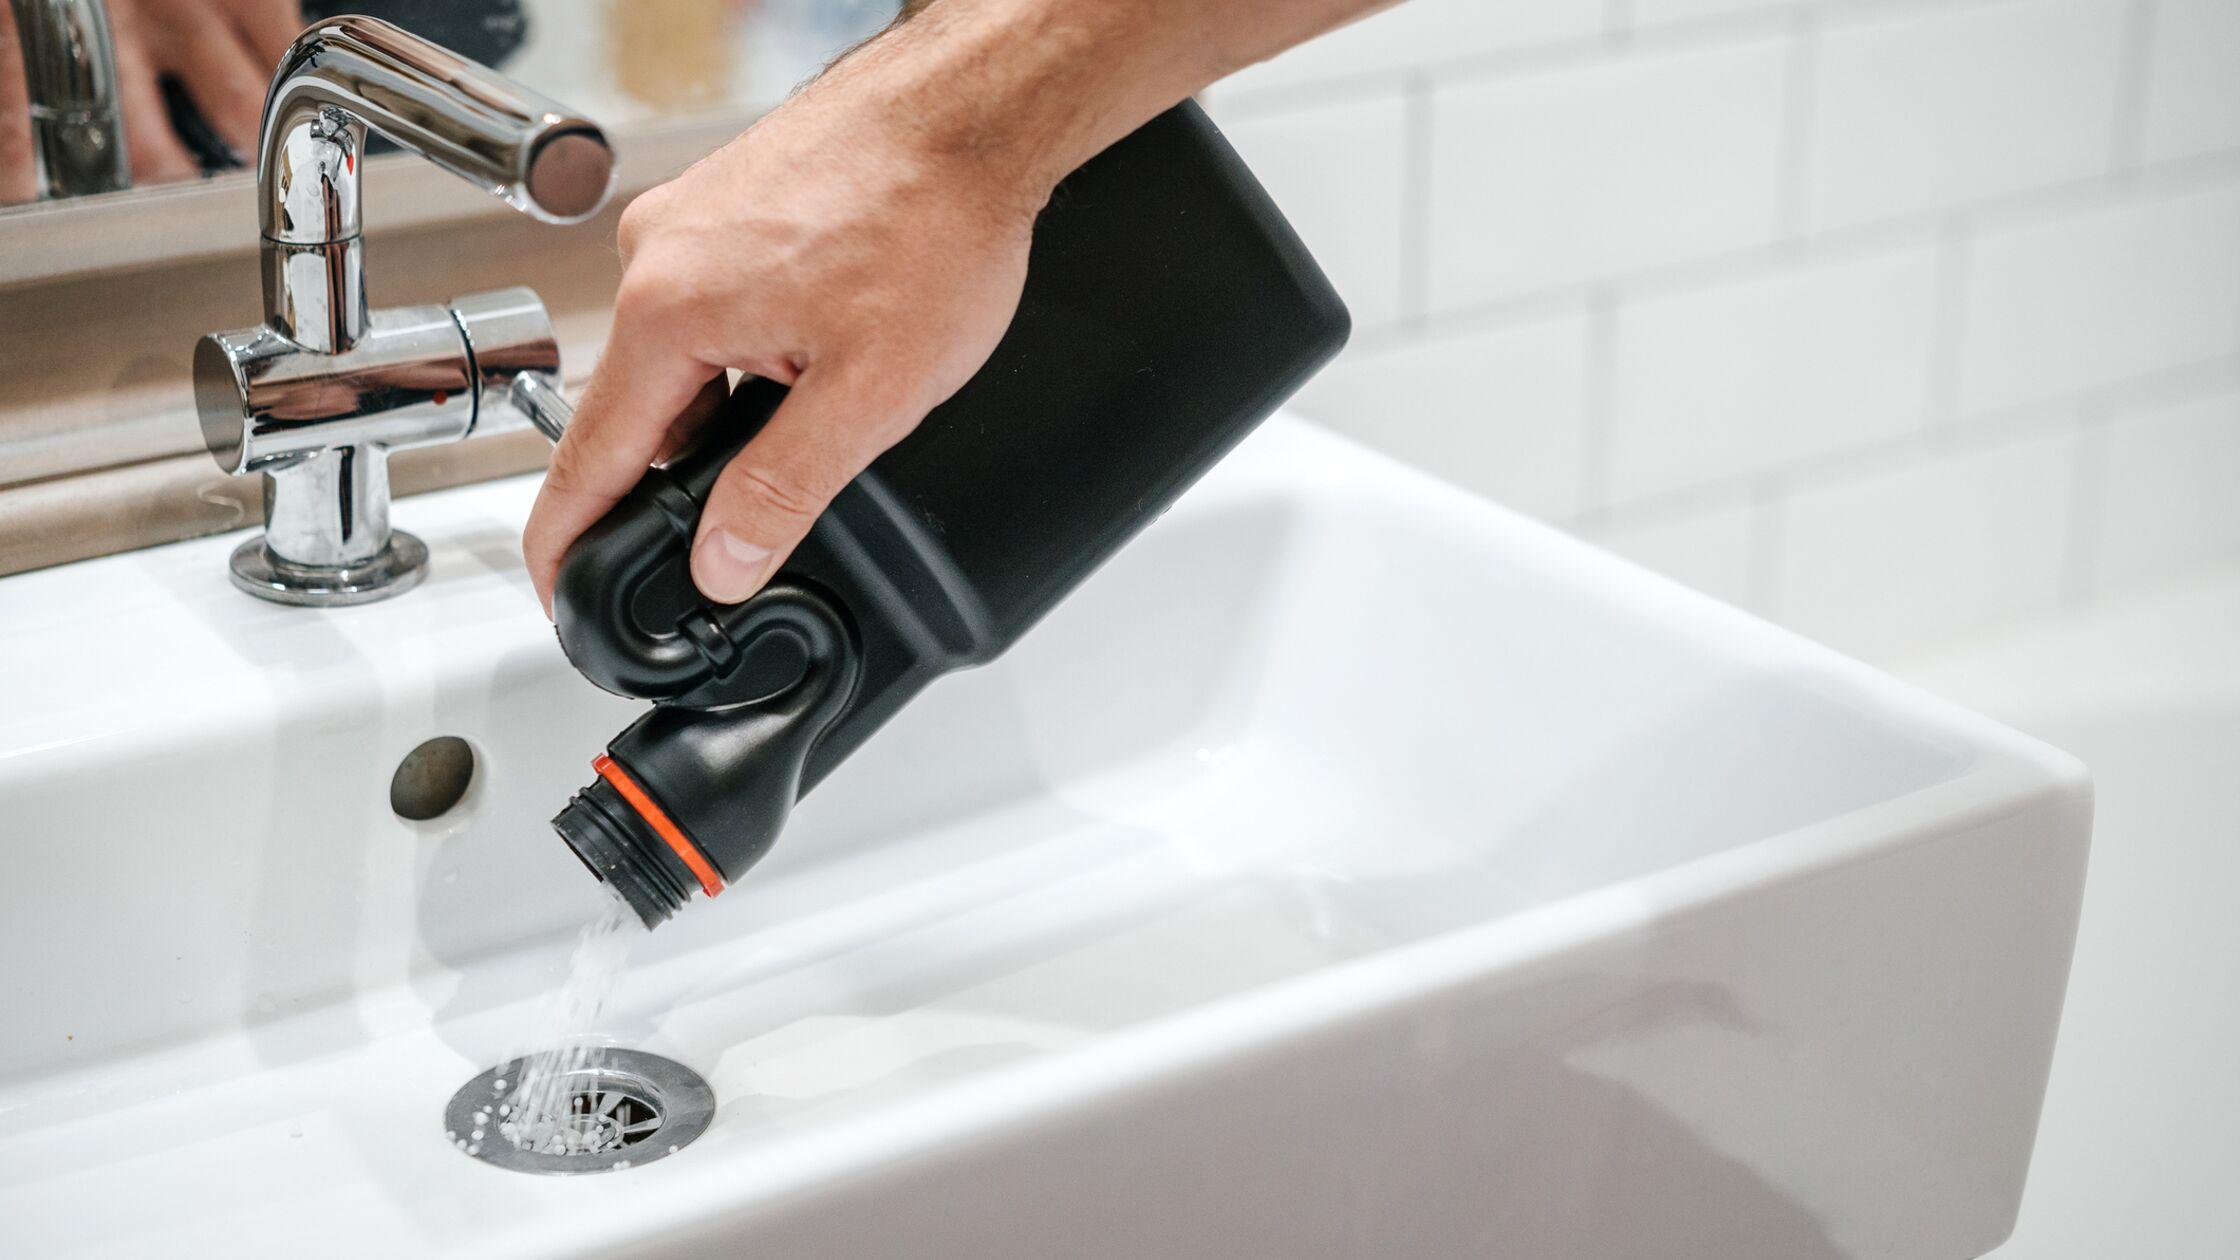 Siphon reinigen: Verstopften Abfluss selbst reparieren